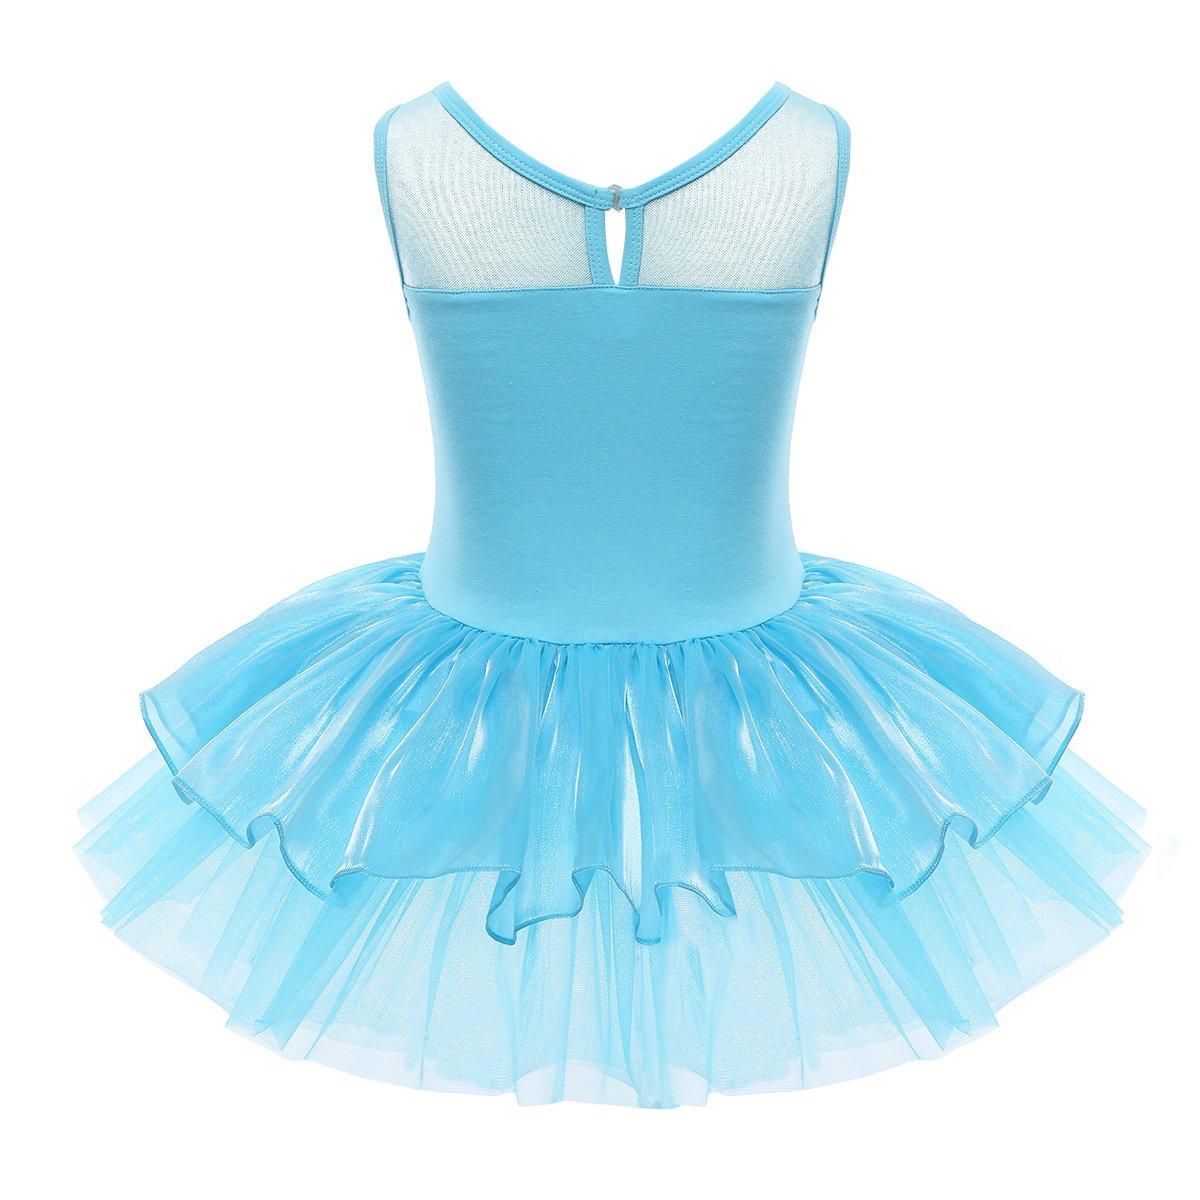 iEFiEL Kids Girls Sequins Ballet Tutu Dress Camisole Gymnastic Dance Leotard Dancewear Costume